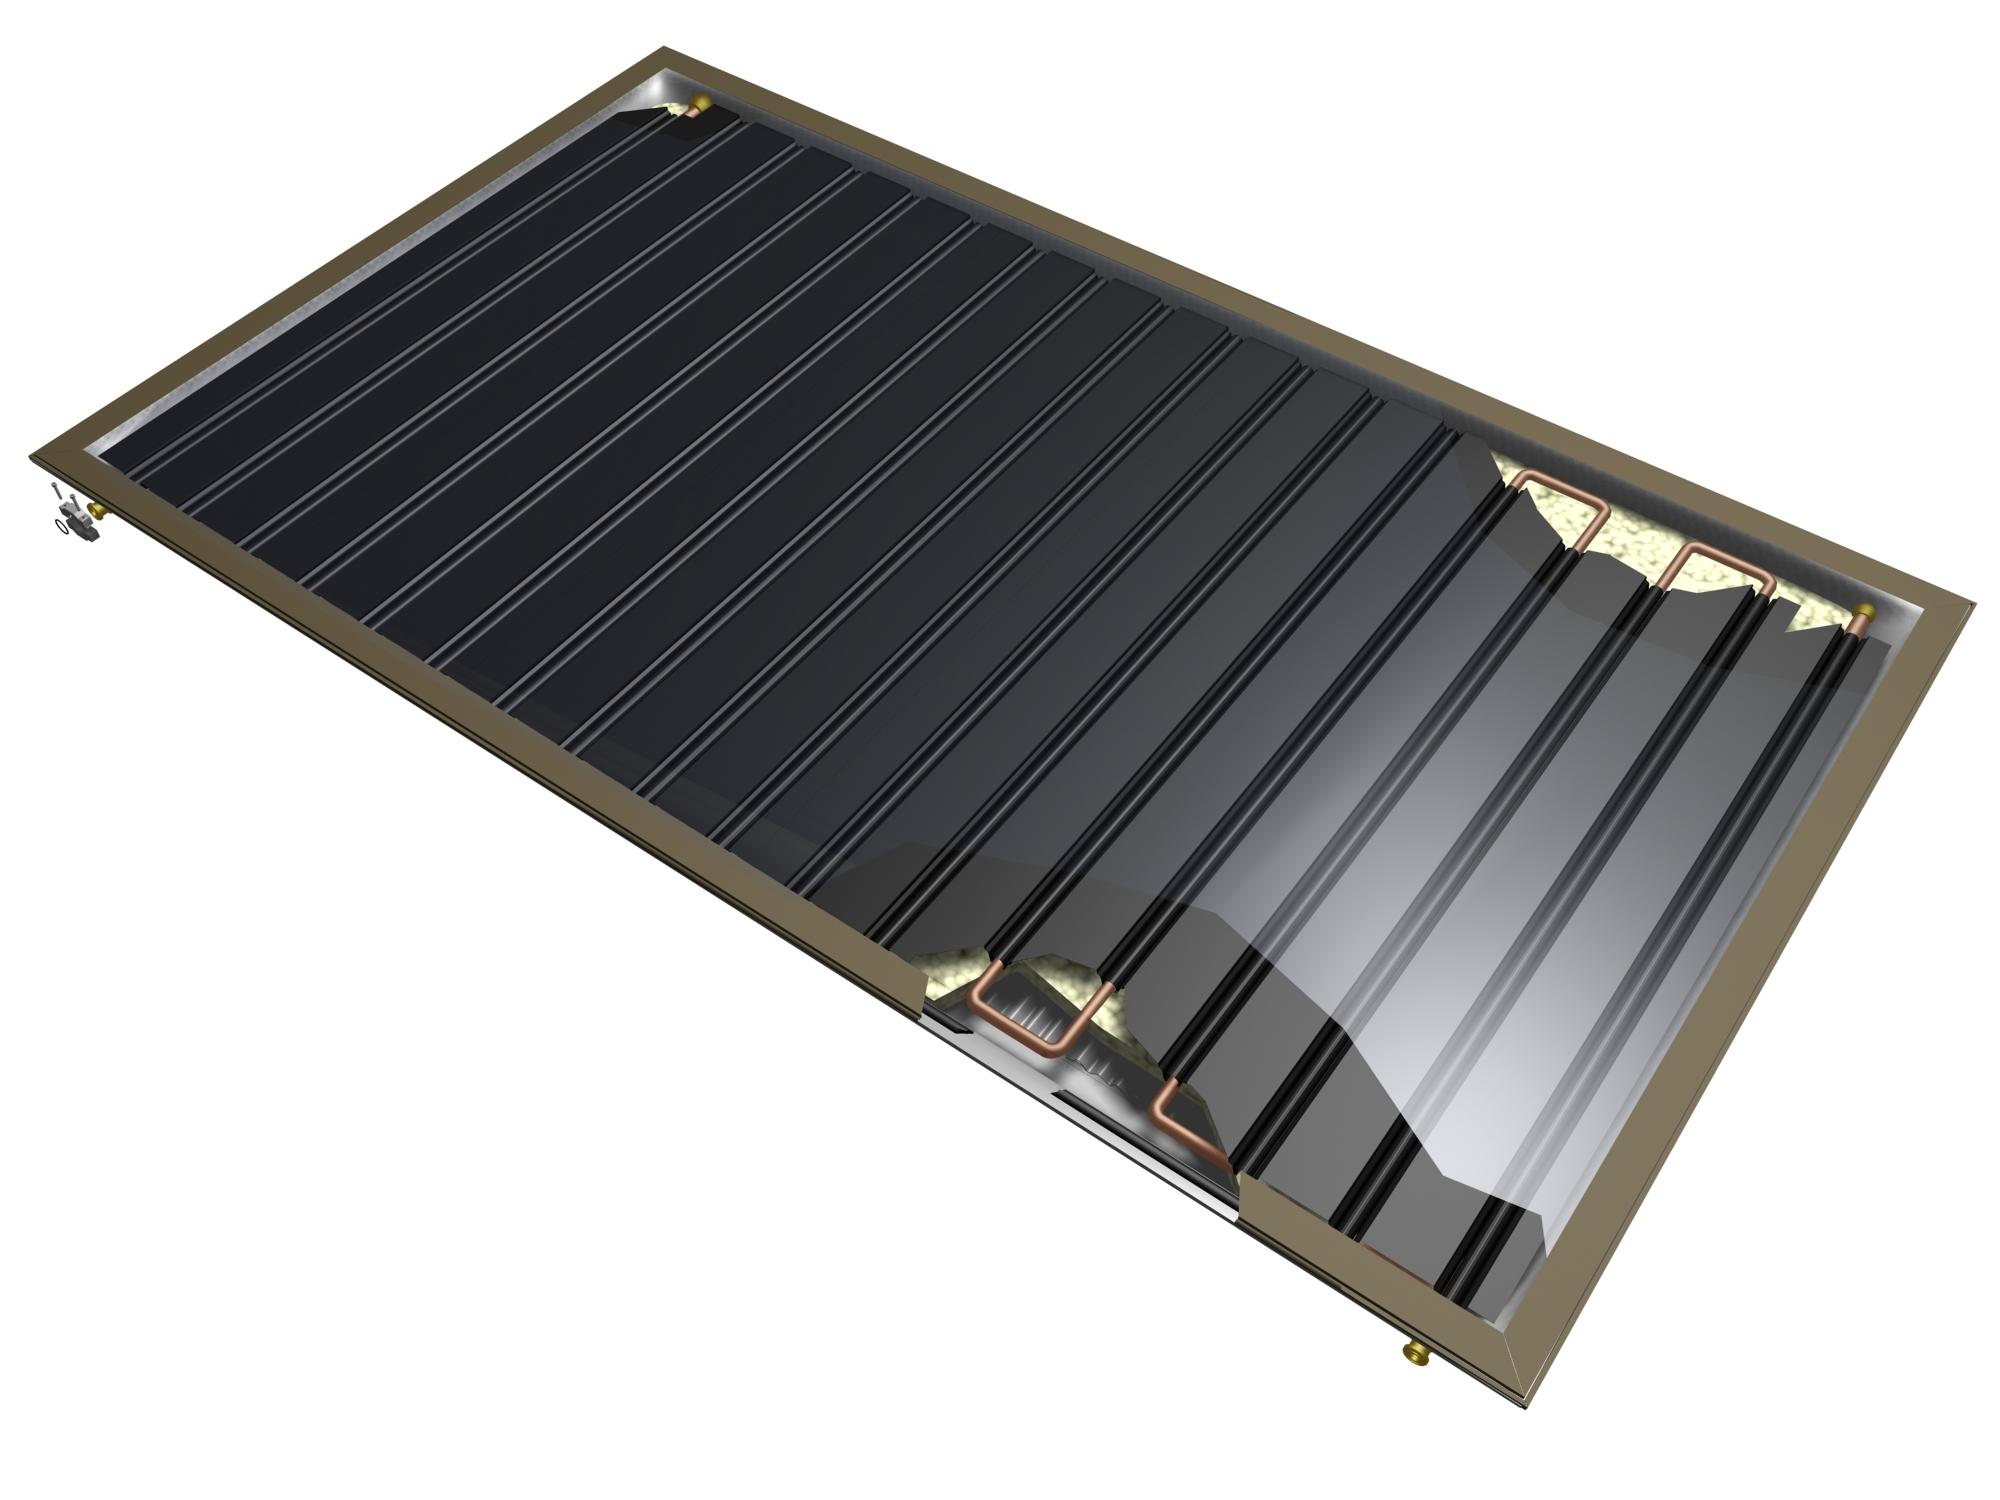 Solární technika Ostrava